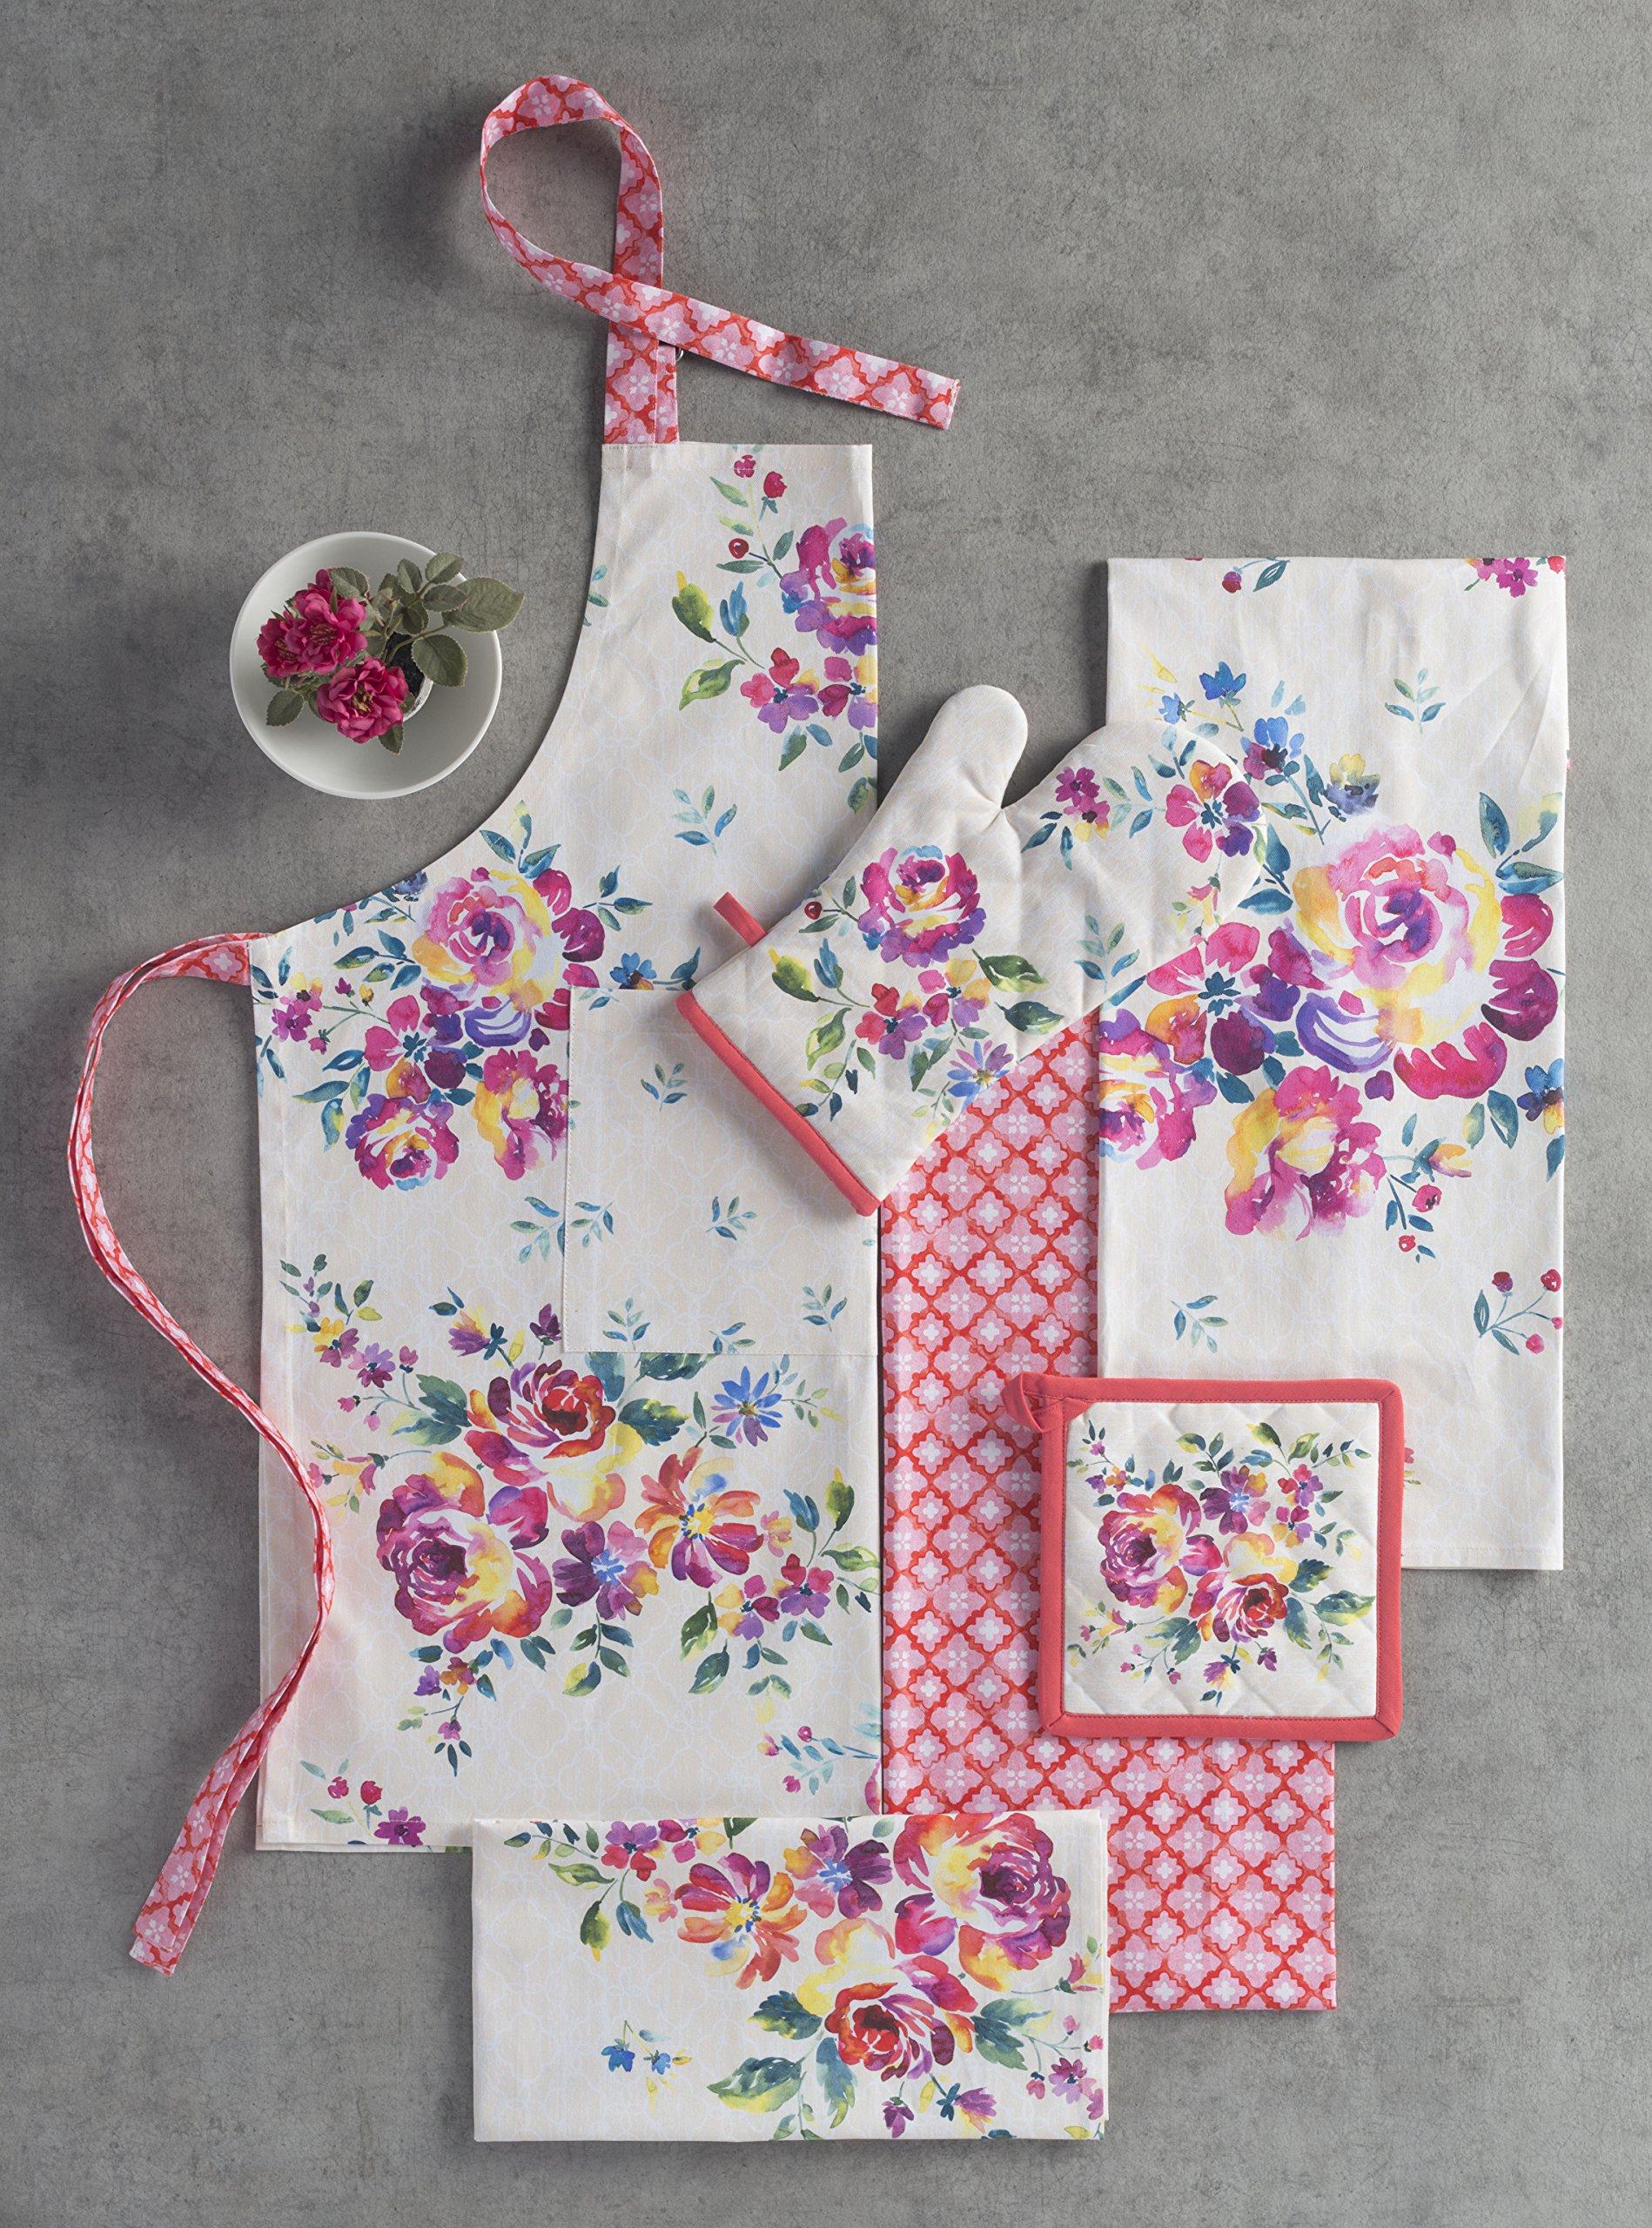 Maison d' Hermine Rose Garden 100% Cotton Apron with an adjustable neck & Visible center pocket 27.50 Inch by 31.50 Inch by Maison d' Hermine (Image #6)